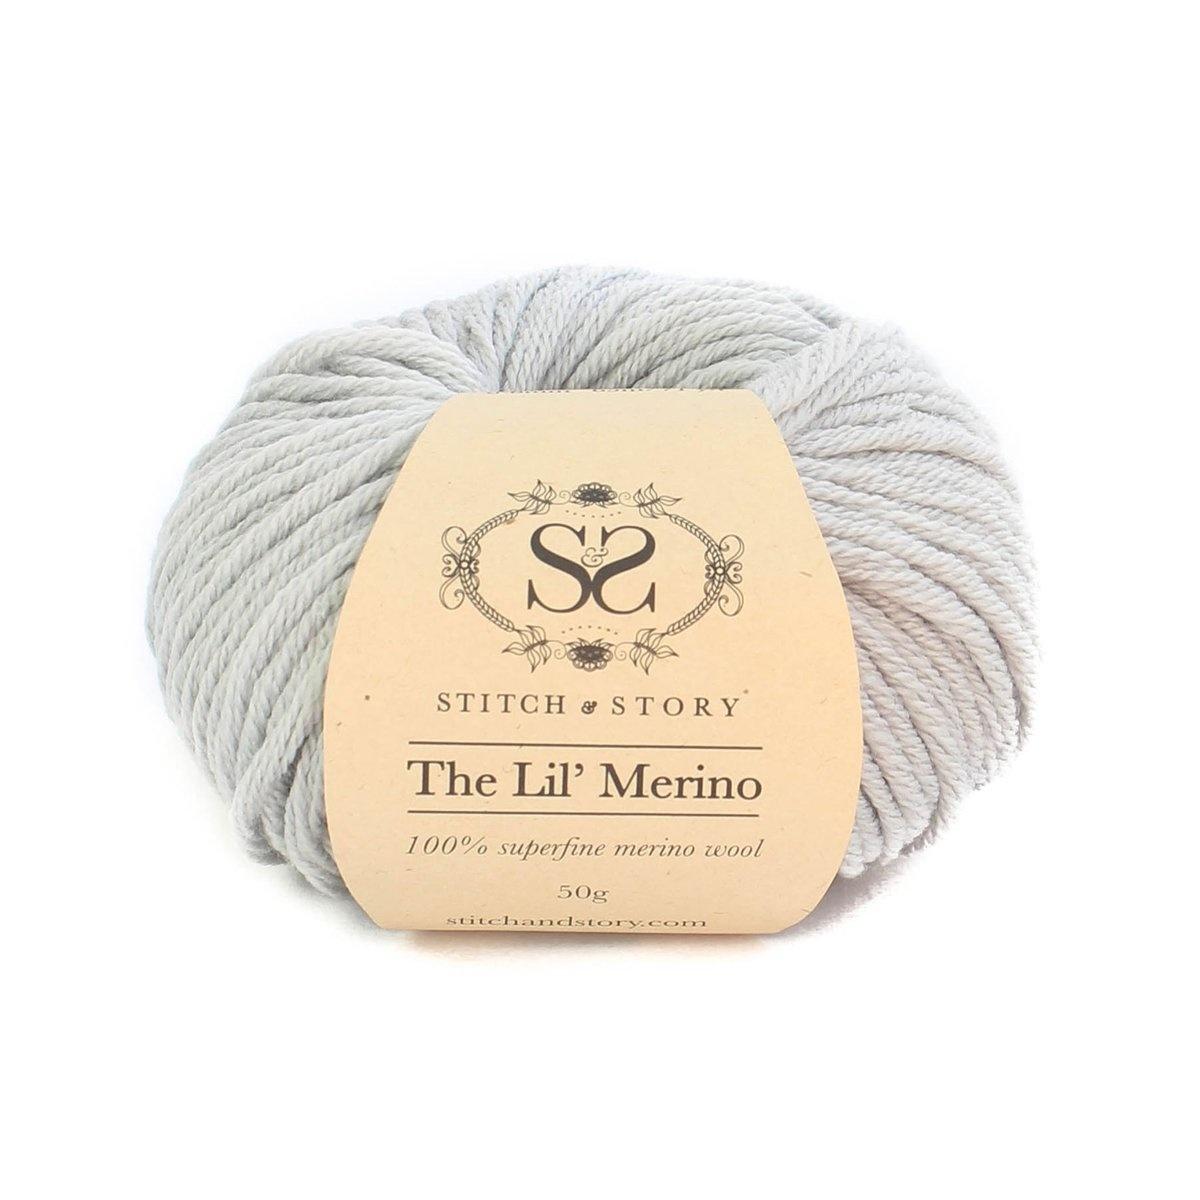 Booties Knitting Kit - Dove-1